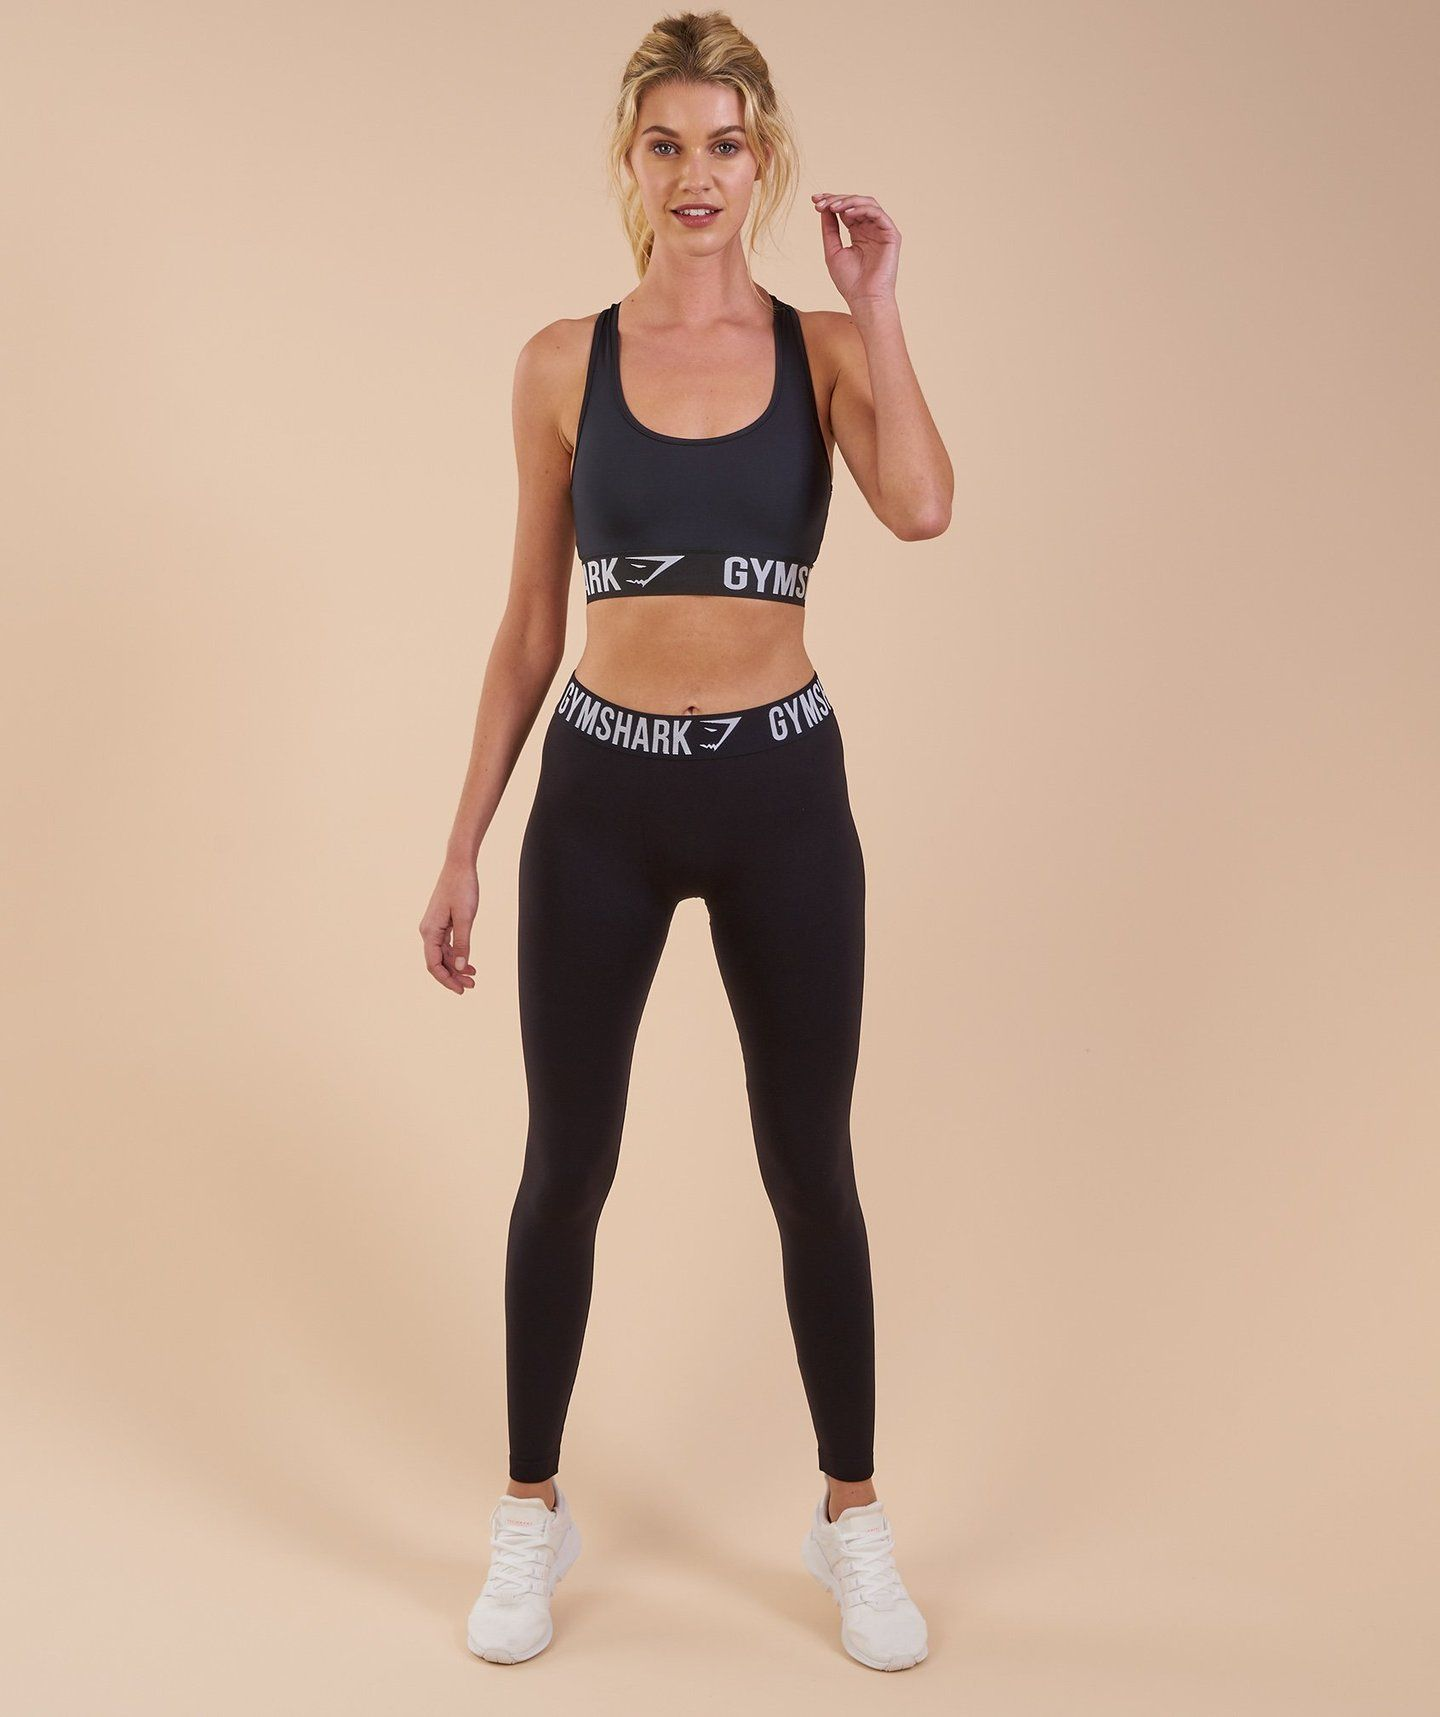 0b11fb5eefa1f4 Gymshark Fit Leggings - Black/White   lounge/activewear   Workout ...